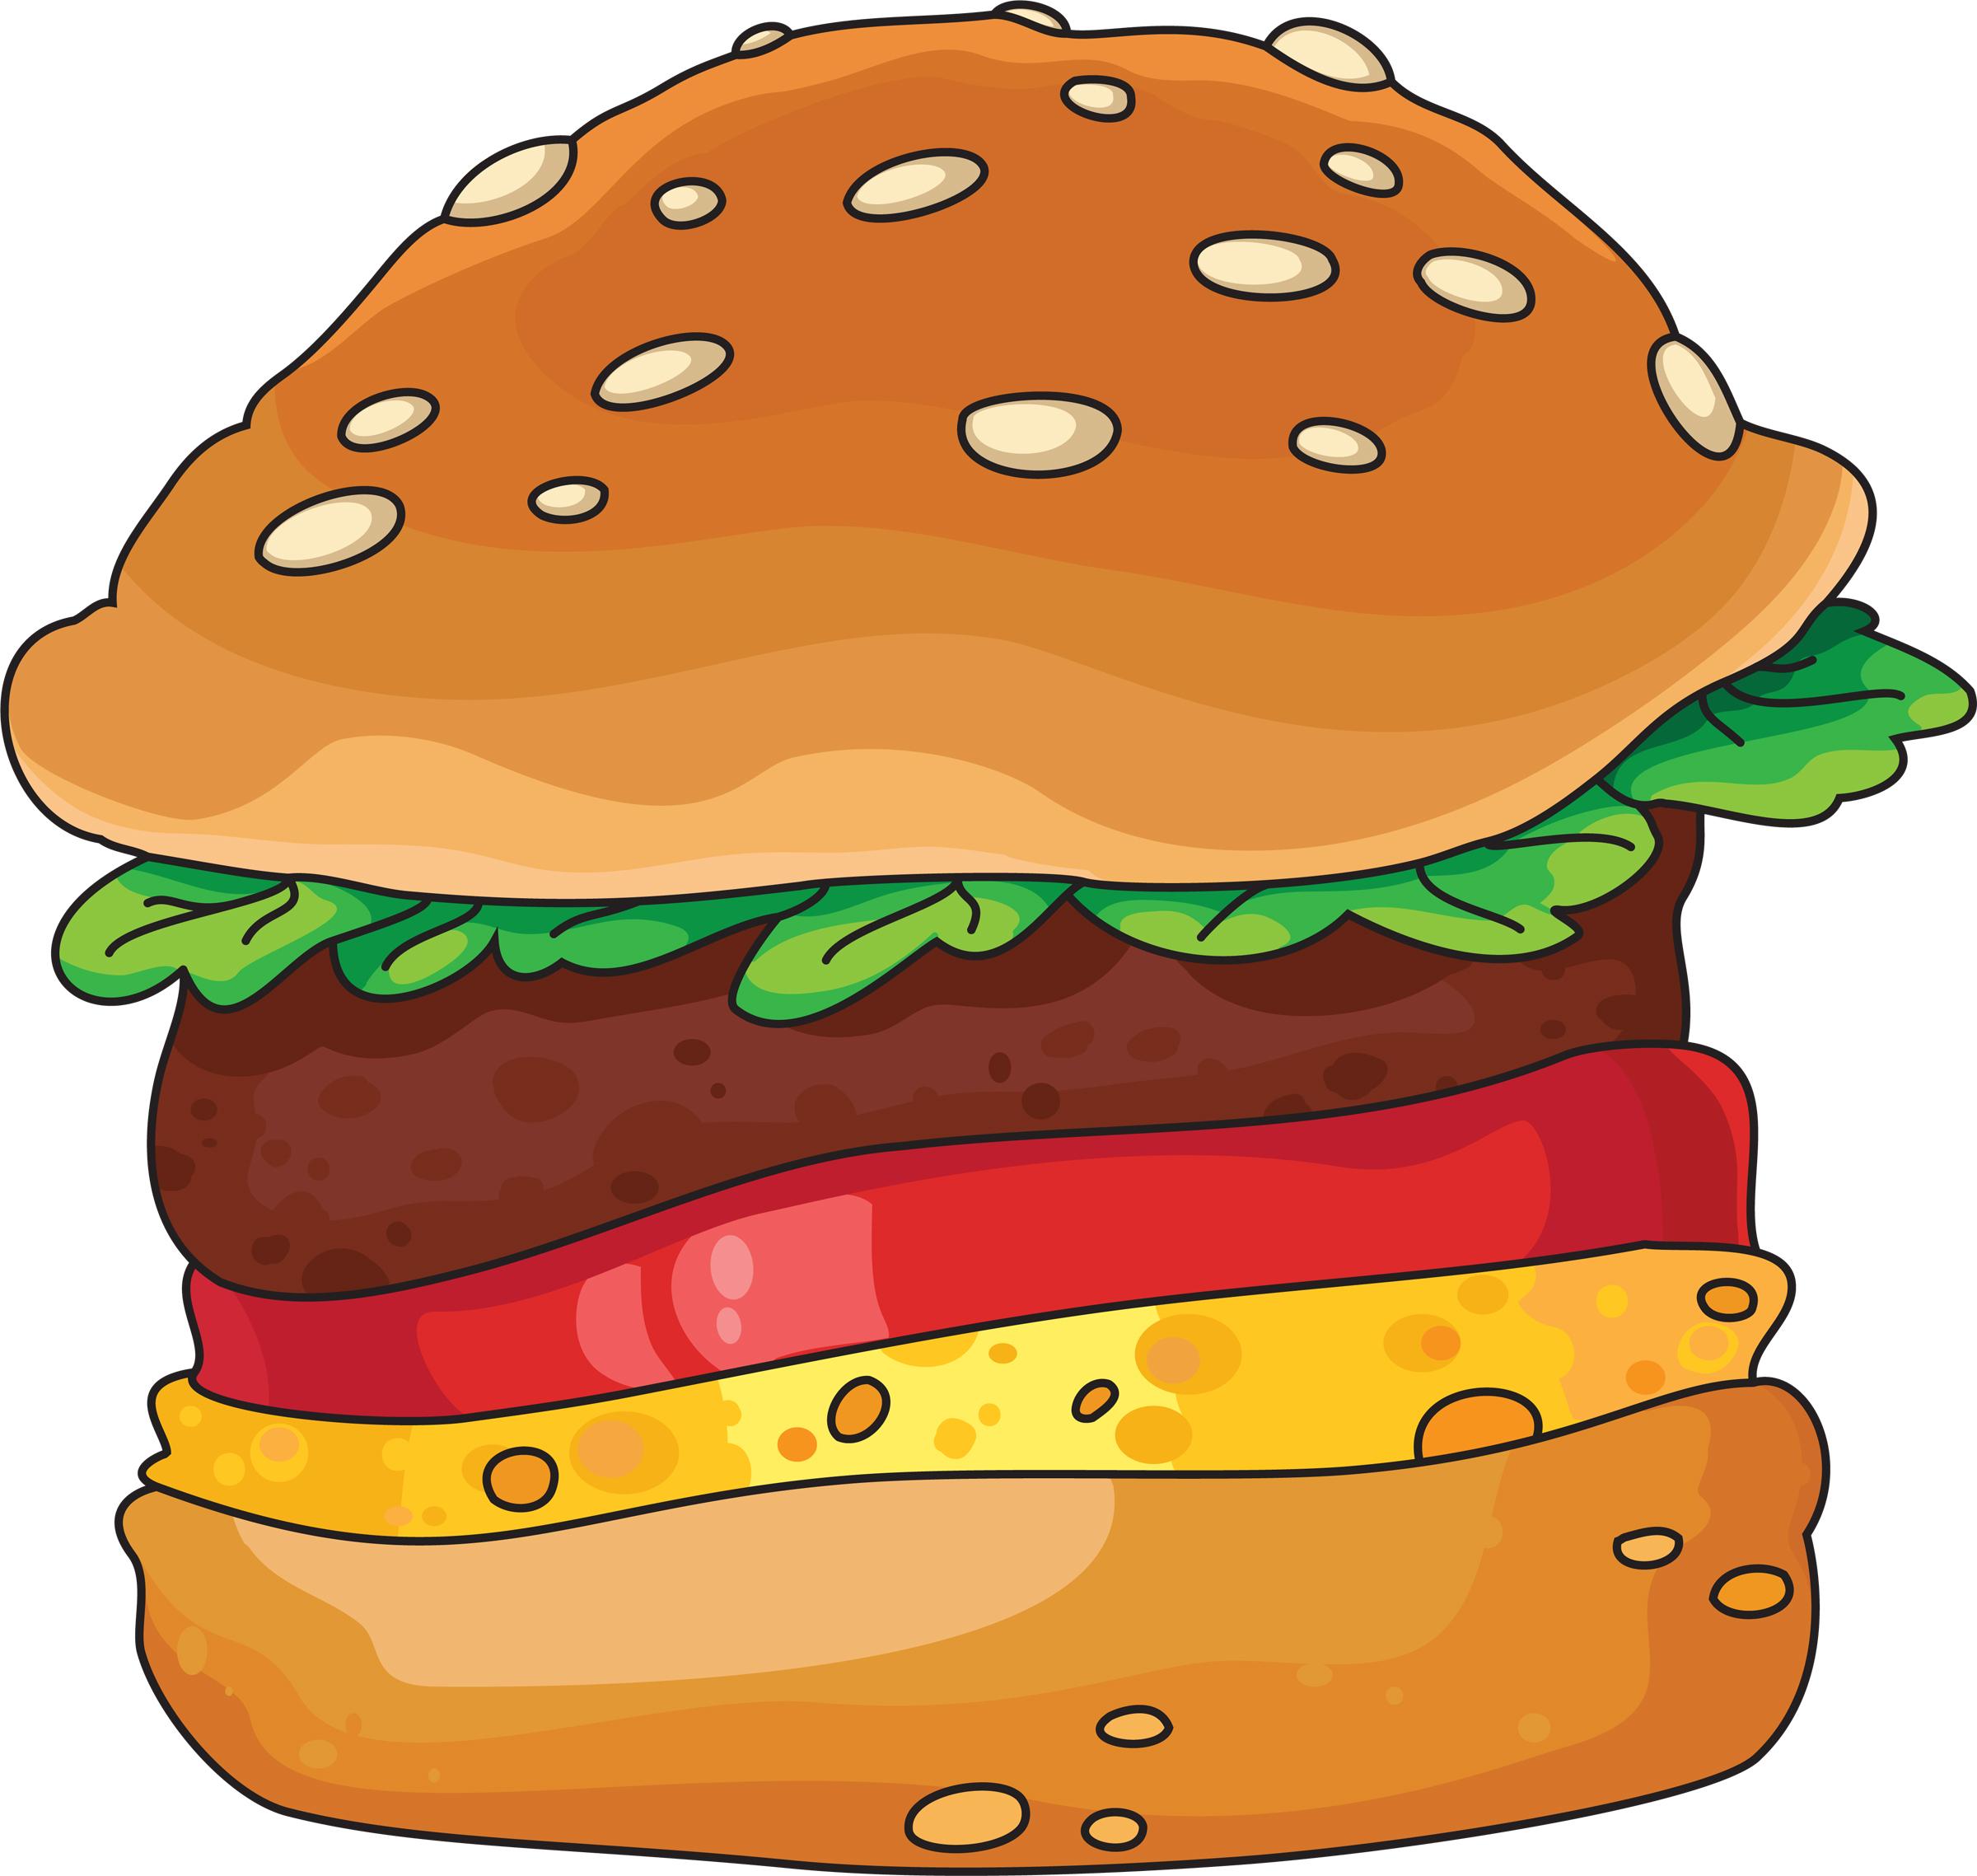 Hamburger cartoon clip art 3 image-Hamburger cartoon clip art 3 image-16